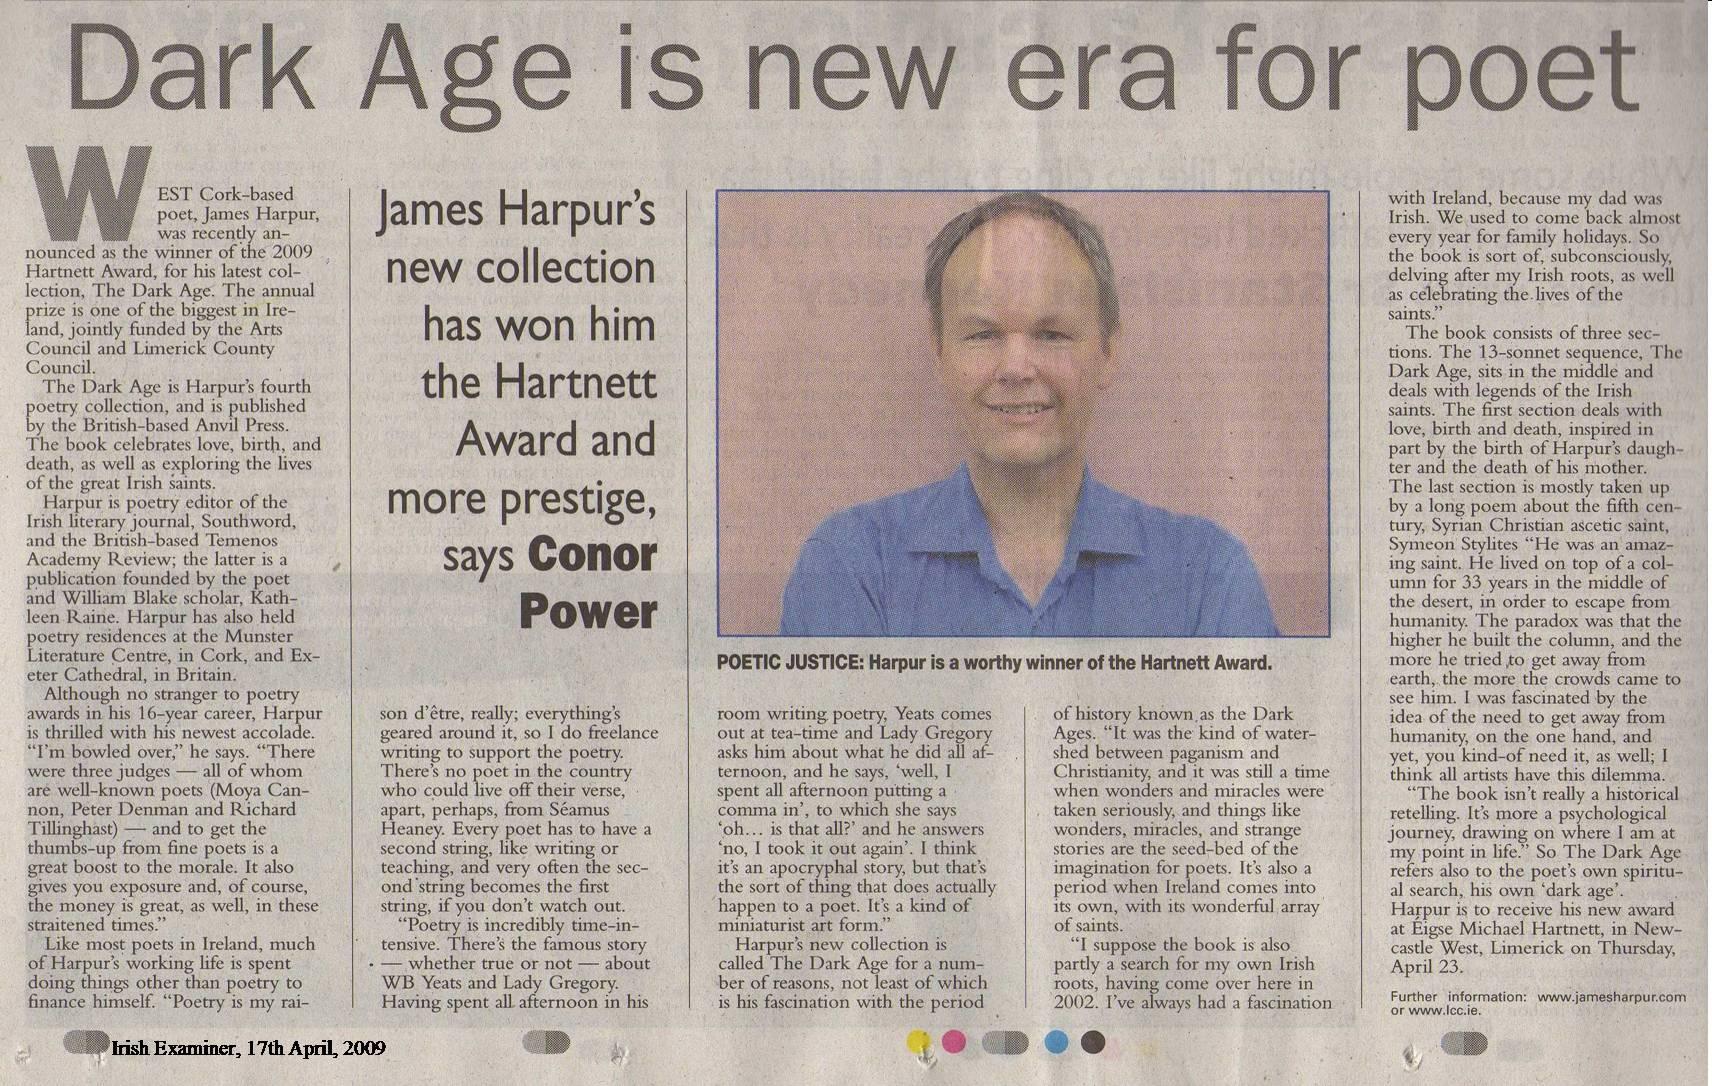 James Harpur